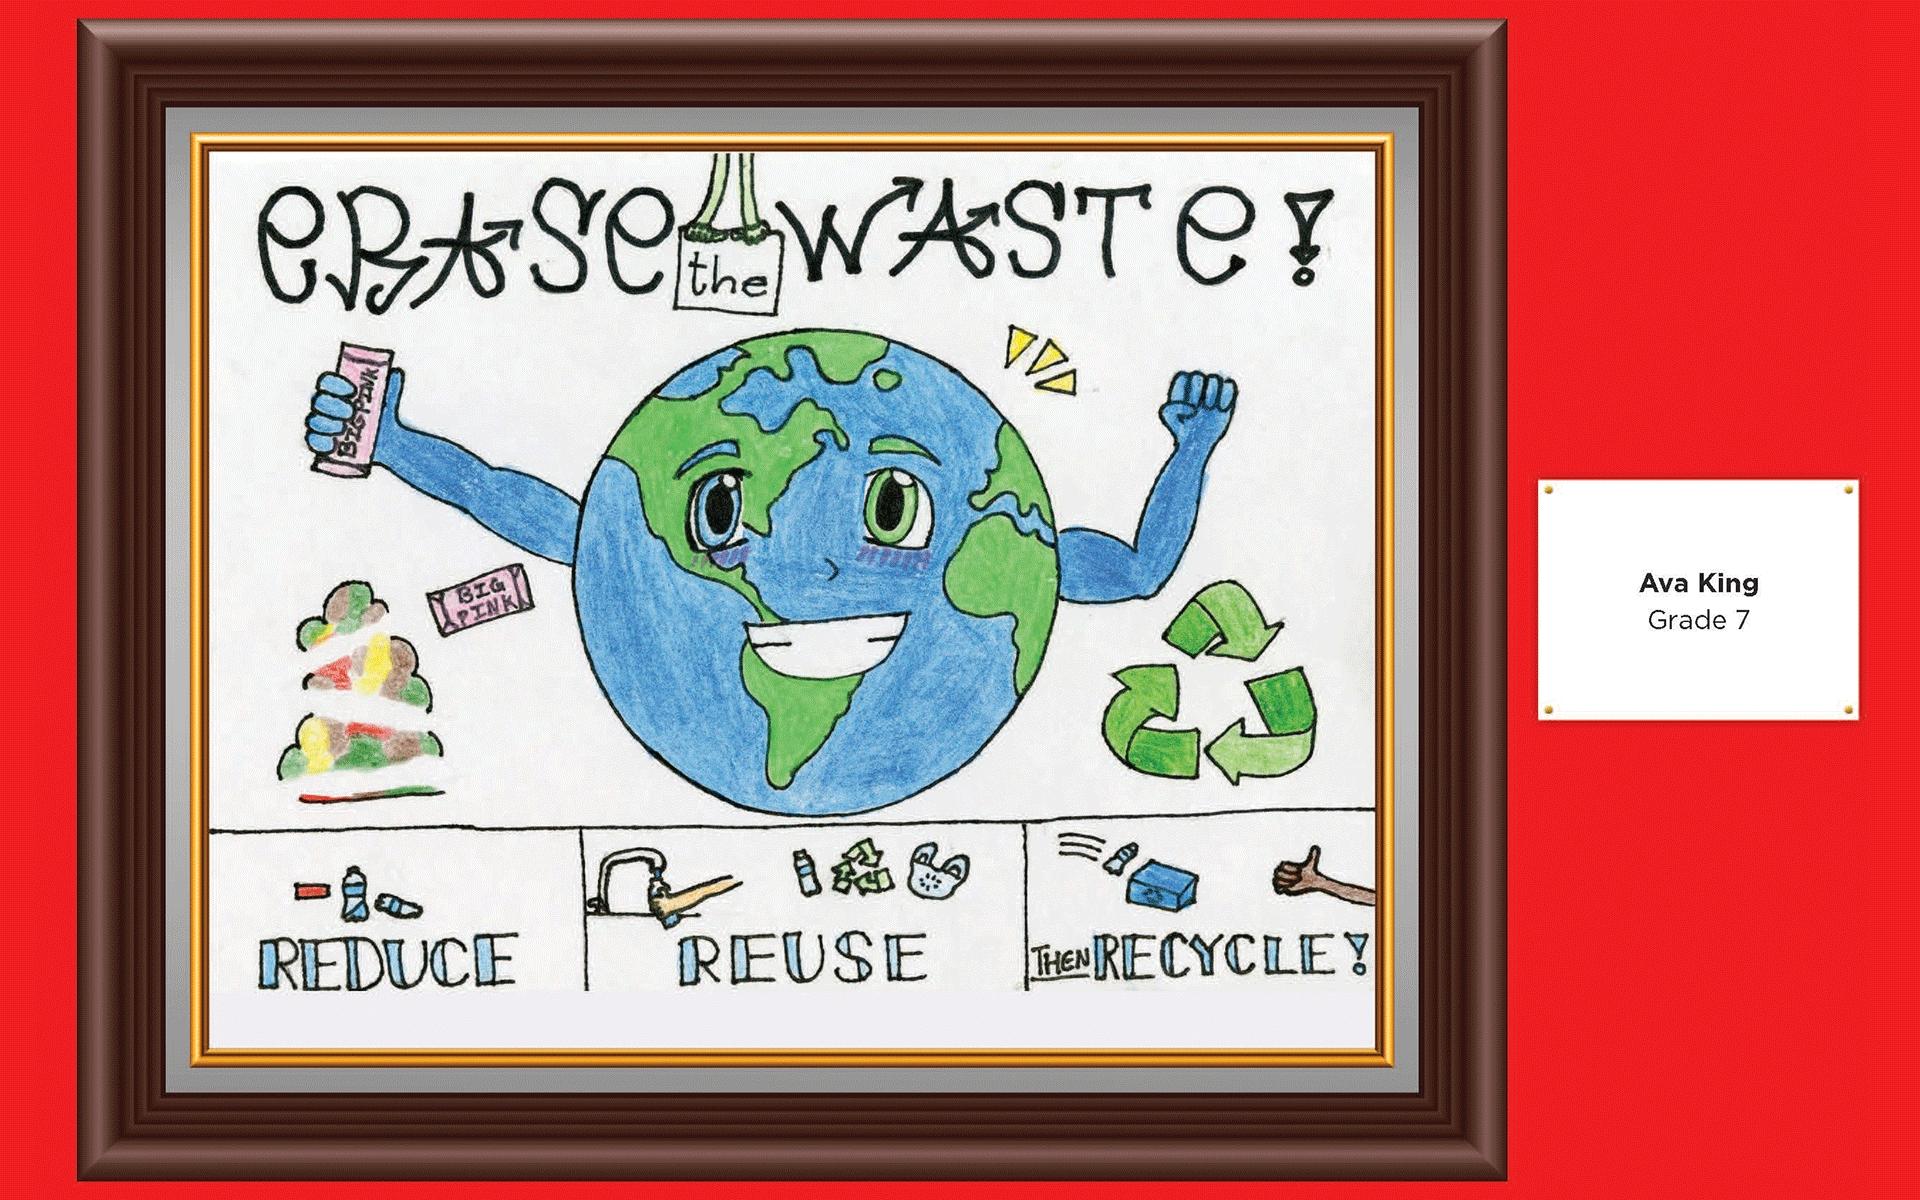 2021 Spokane Recycles Calendar - City Of Spokane, Washington